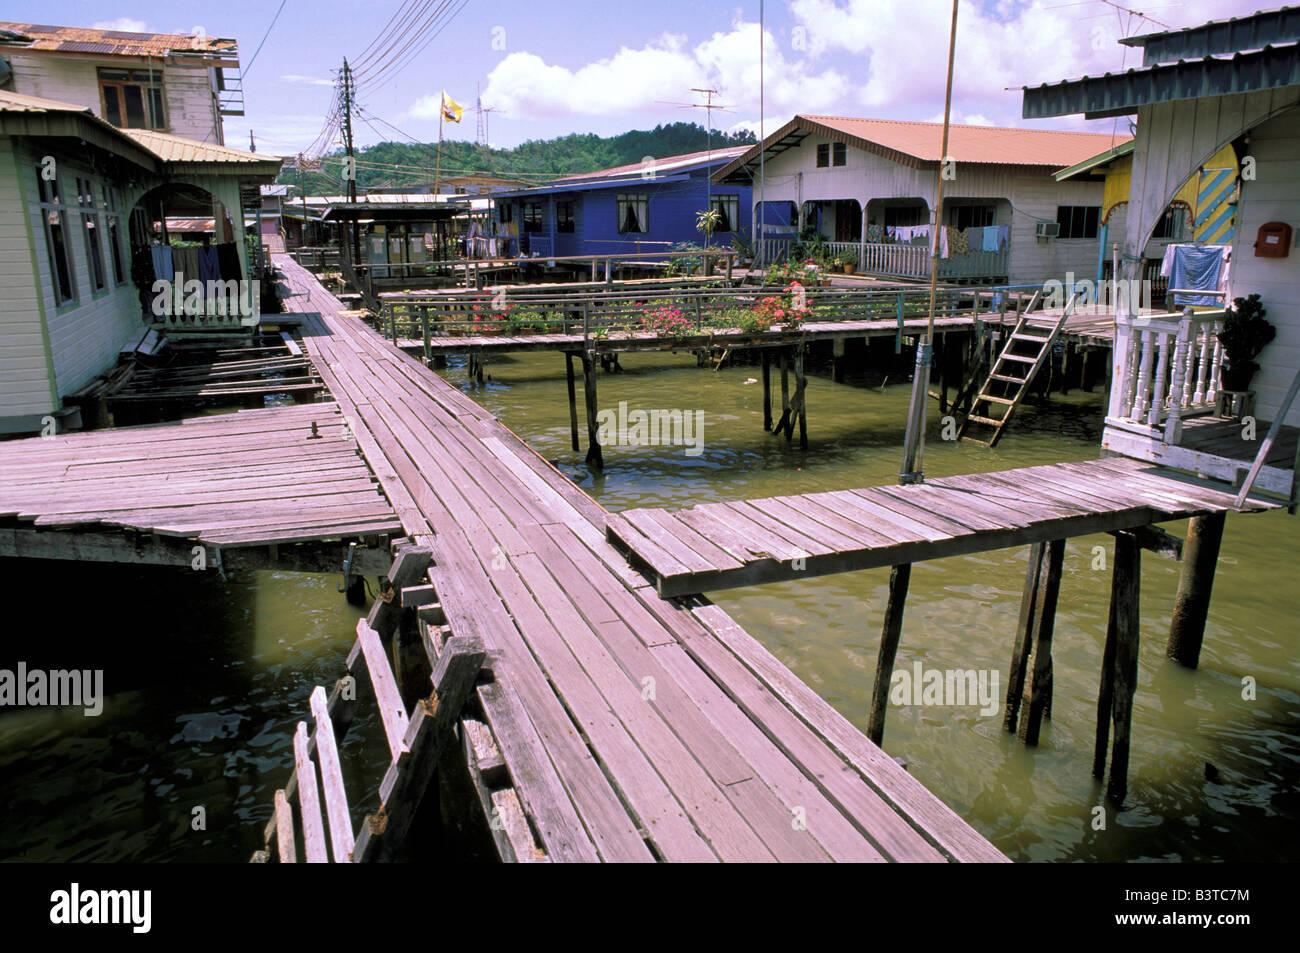 Asia, Brunei, Bandar Seri Begawan. Sidewalks in capitol. - Stock Image